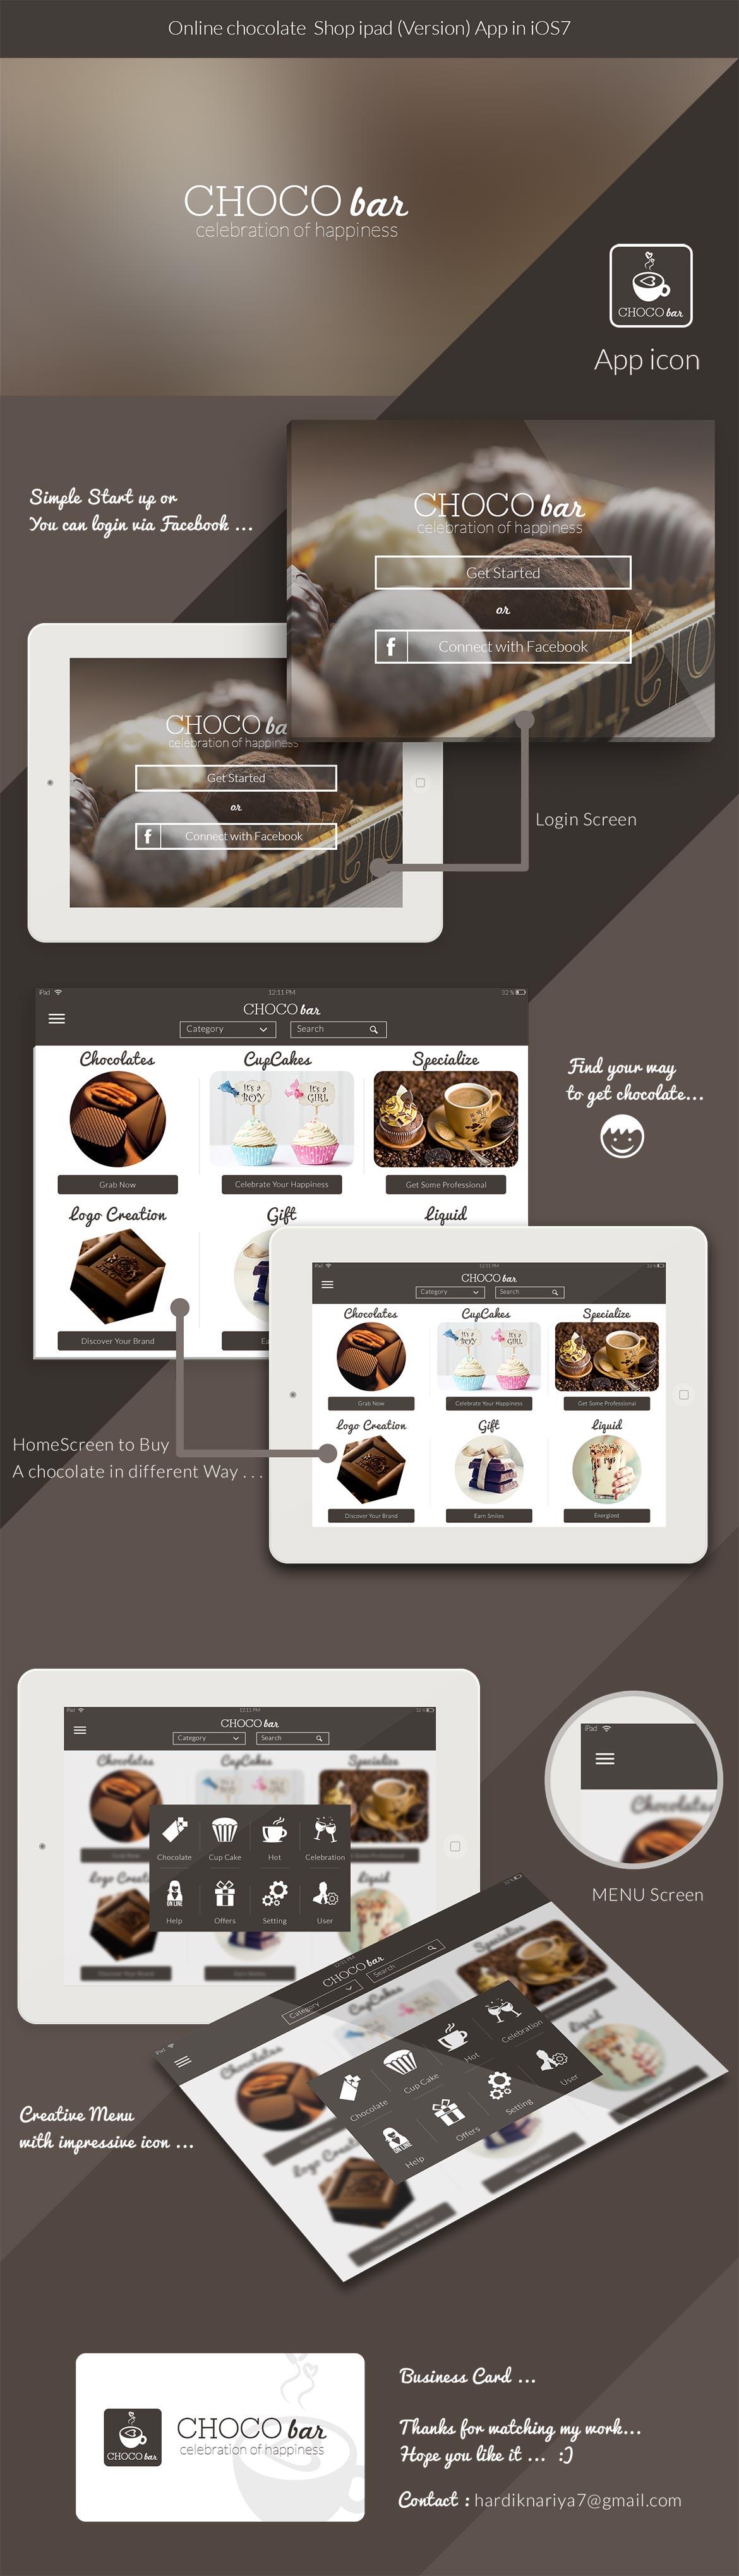 Bakery Store IPad App UI Kit Free PSD